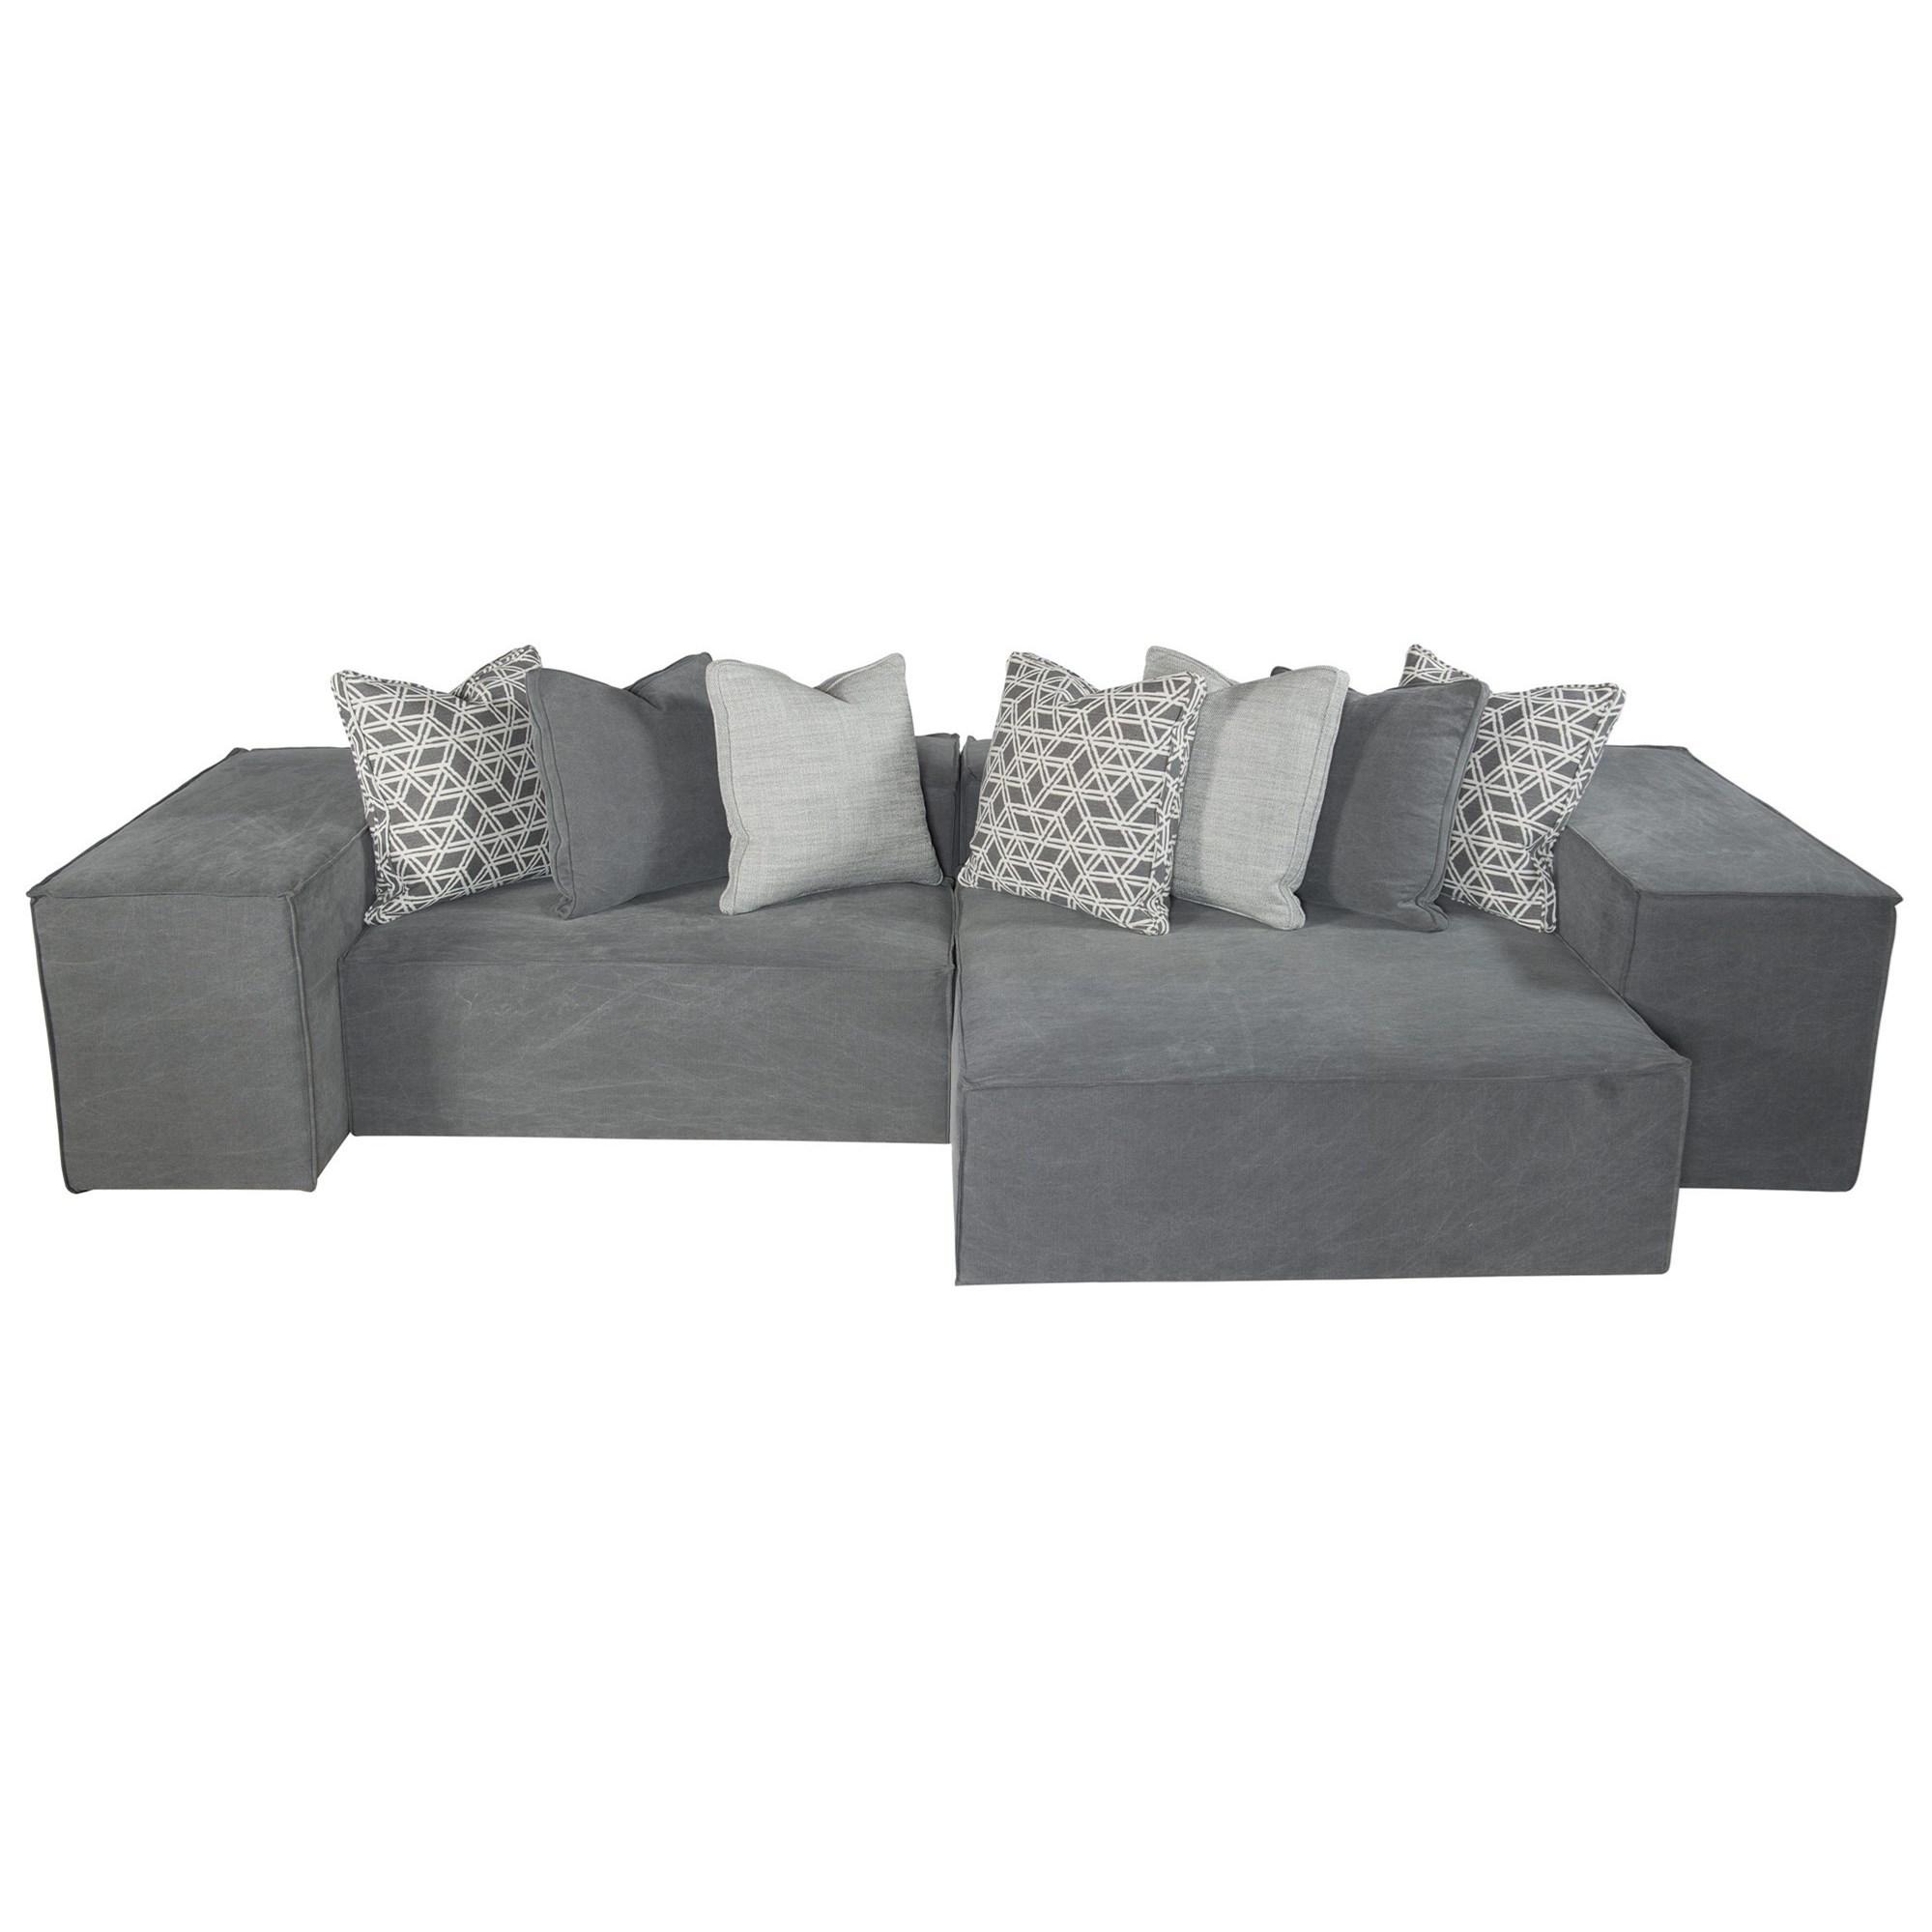 Bernhardt Interiors Format Six Piece Modern Modular Sectional Sofa Belfort Furniture Sectional Sofas